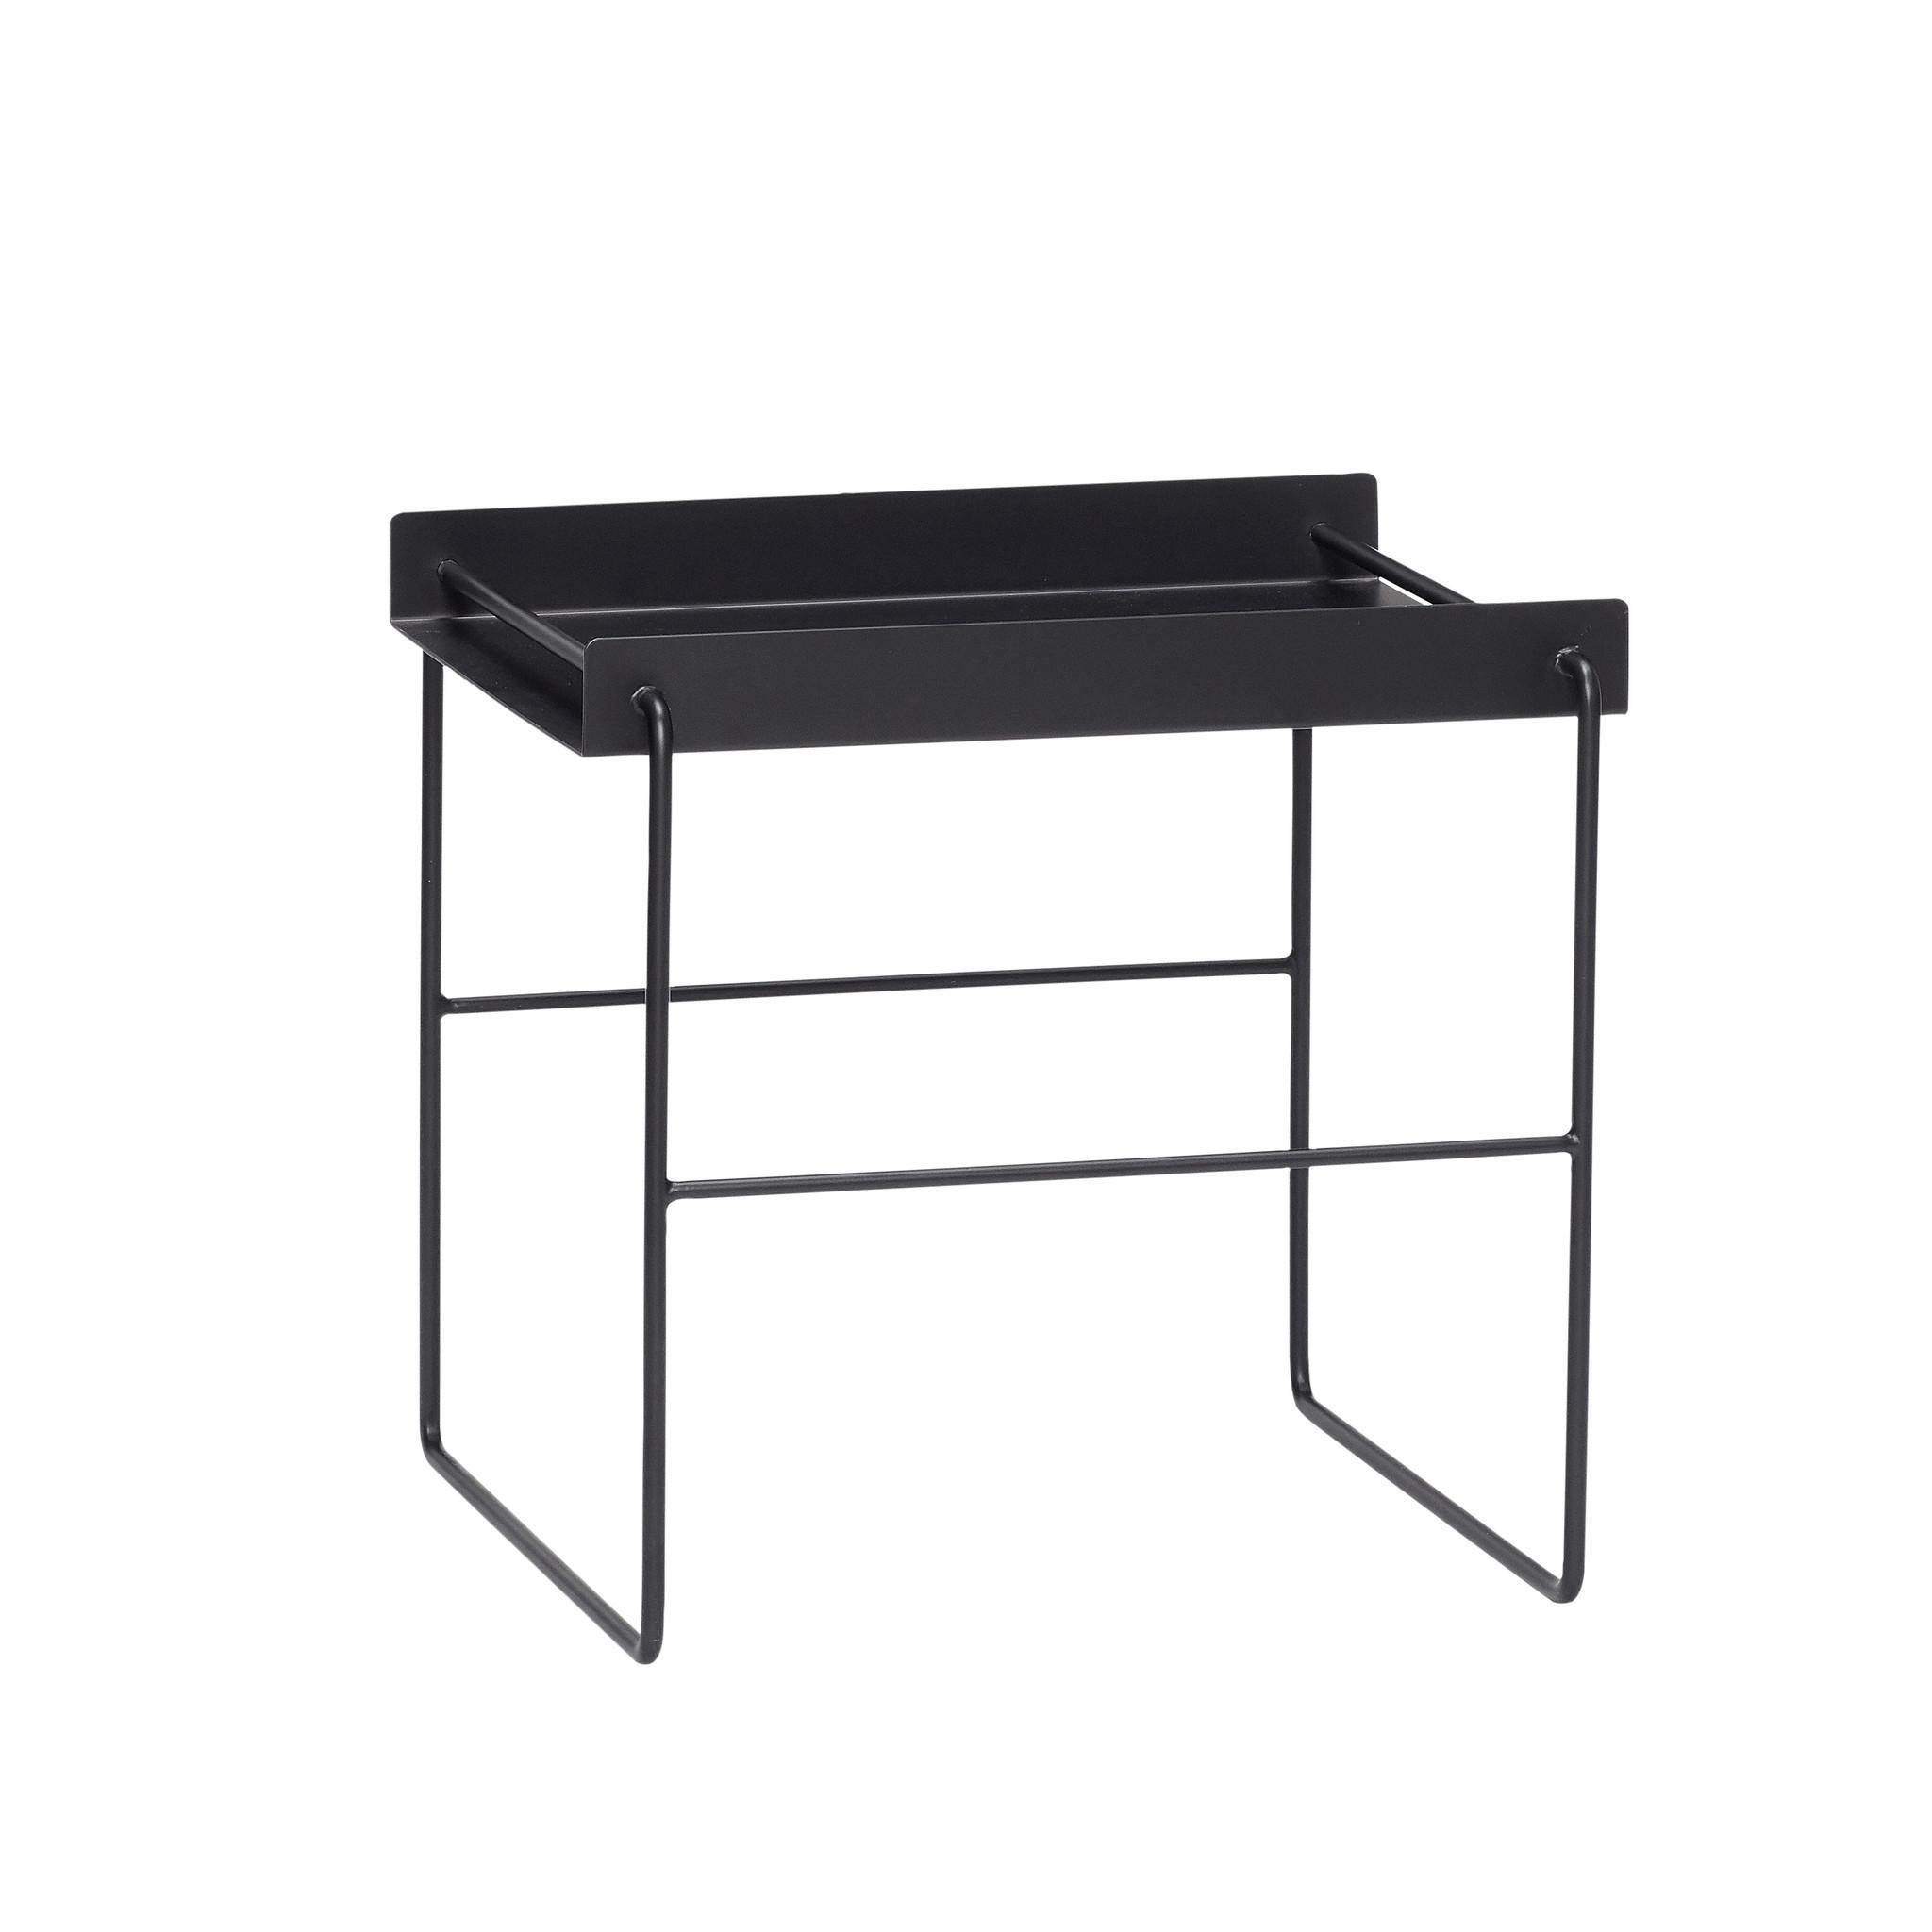 Hubsch Tafel, vierkant, zwart, metaal